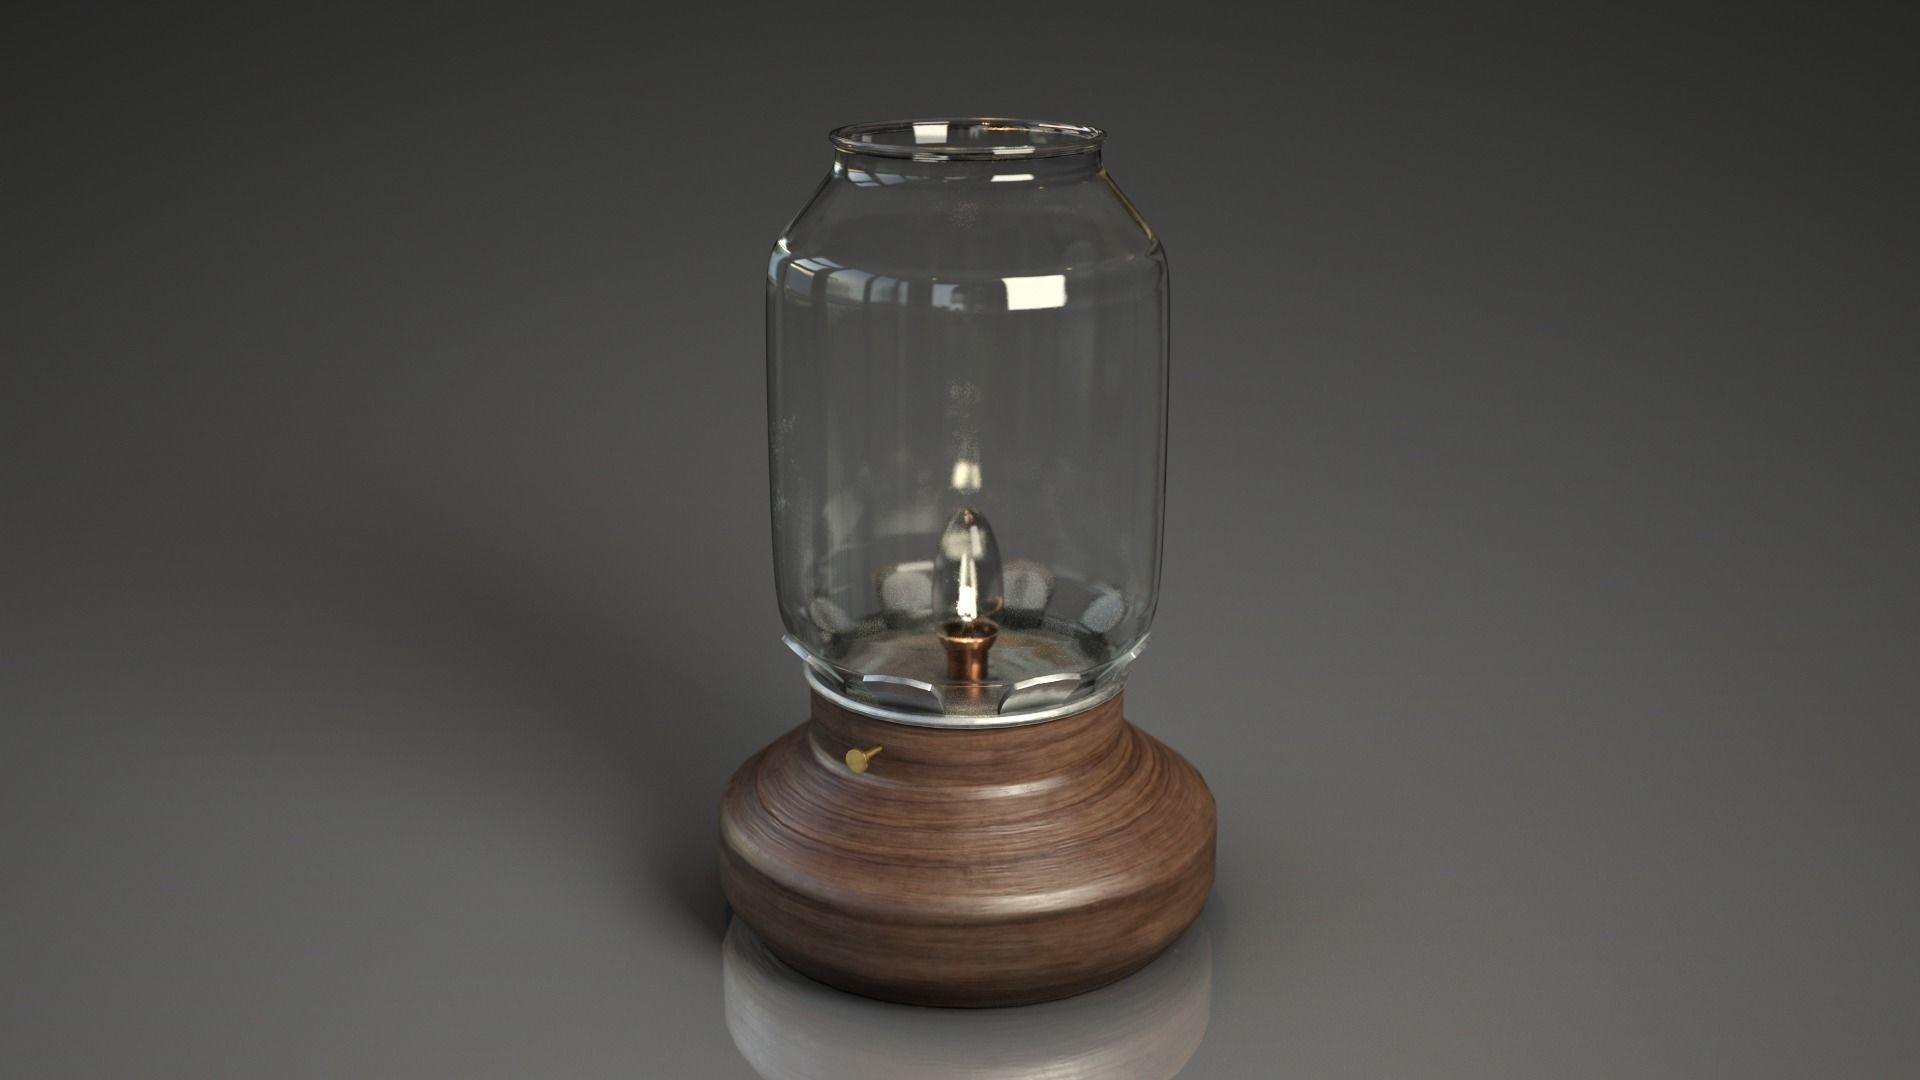 Retro vintage style lamp